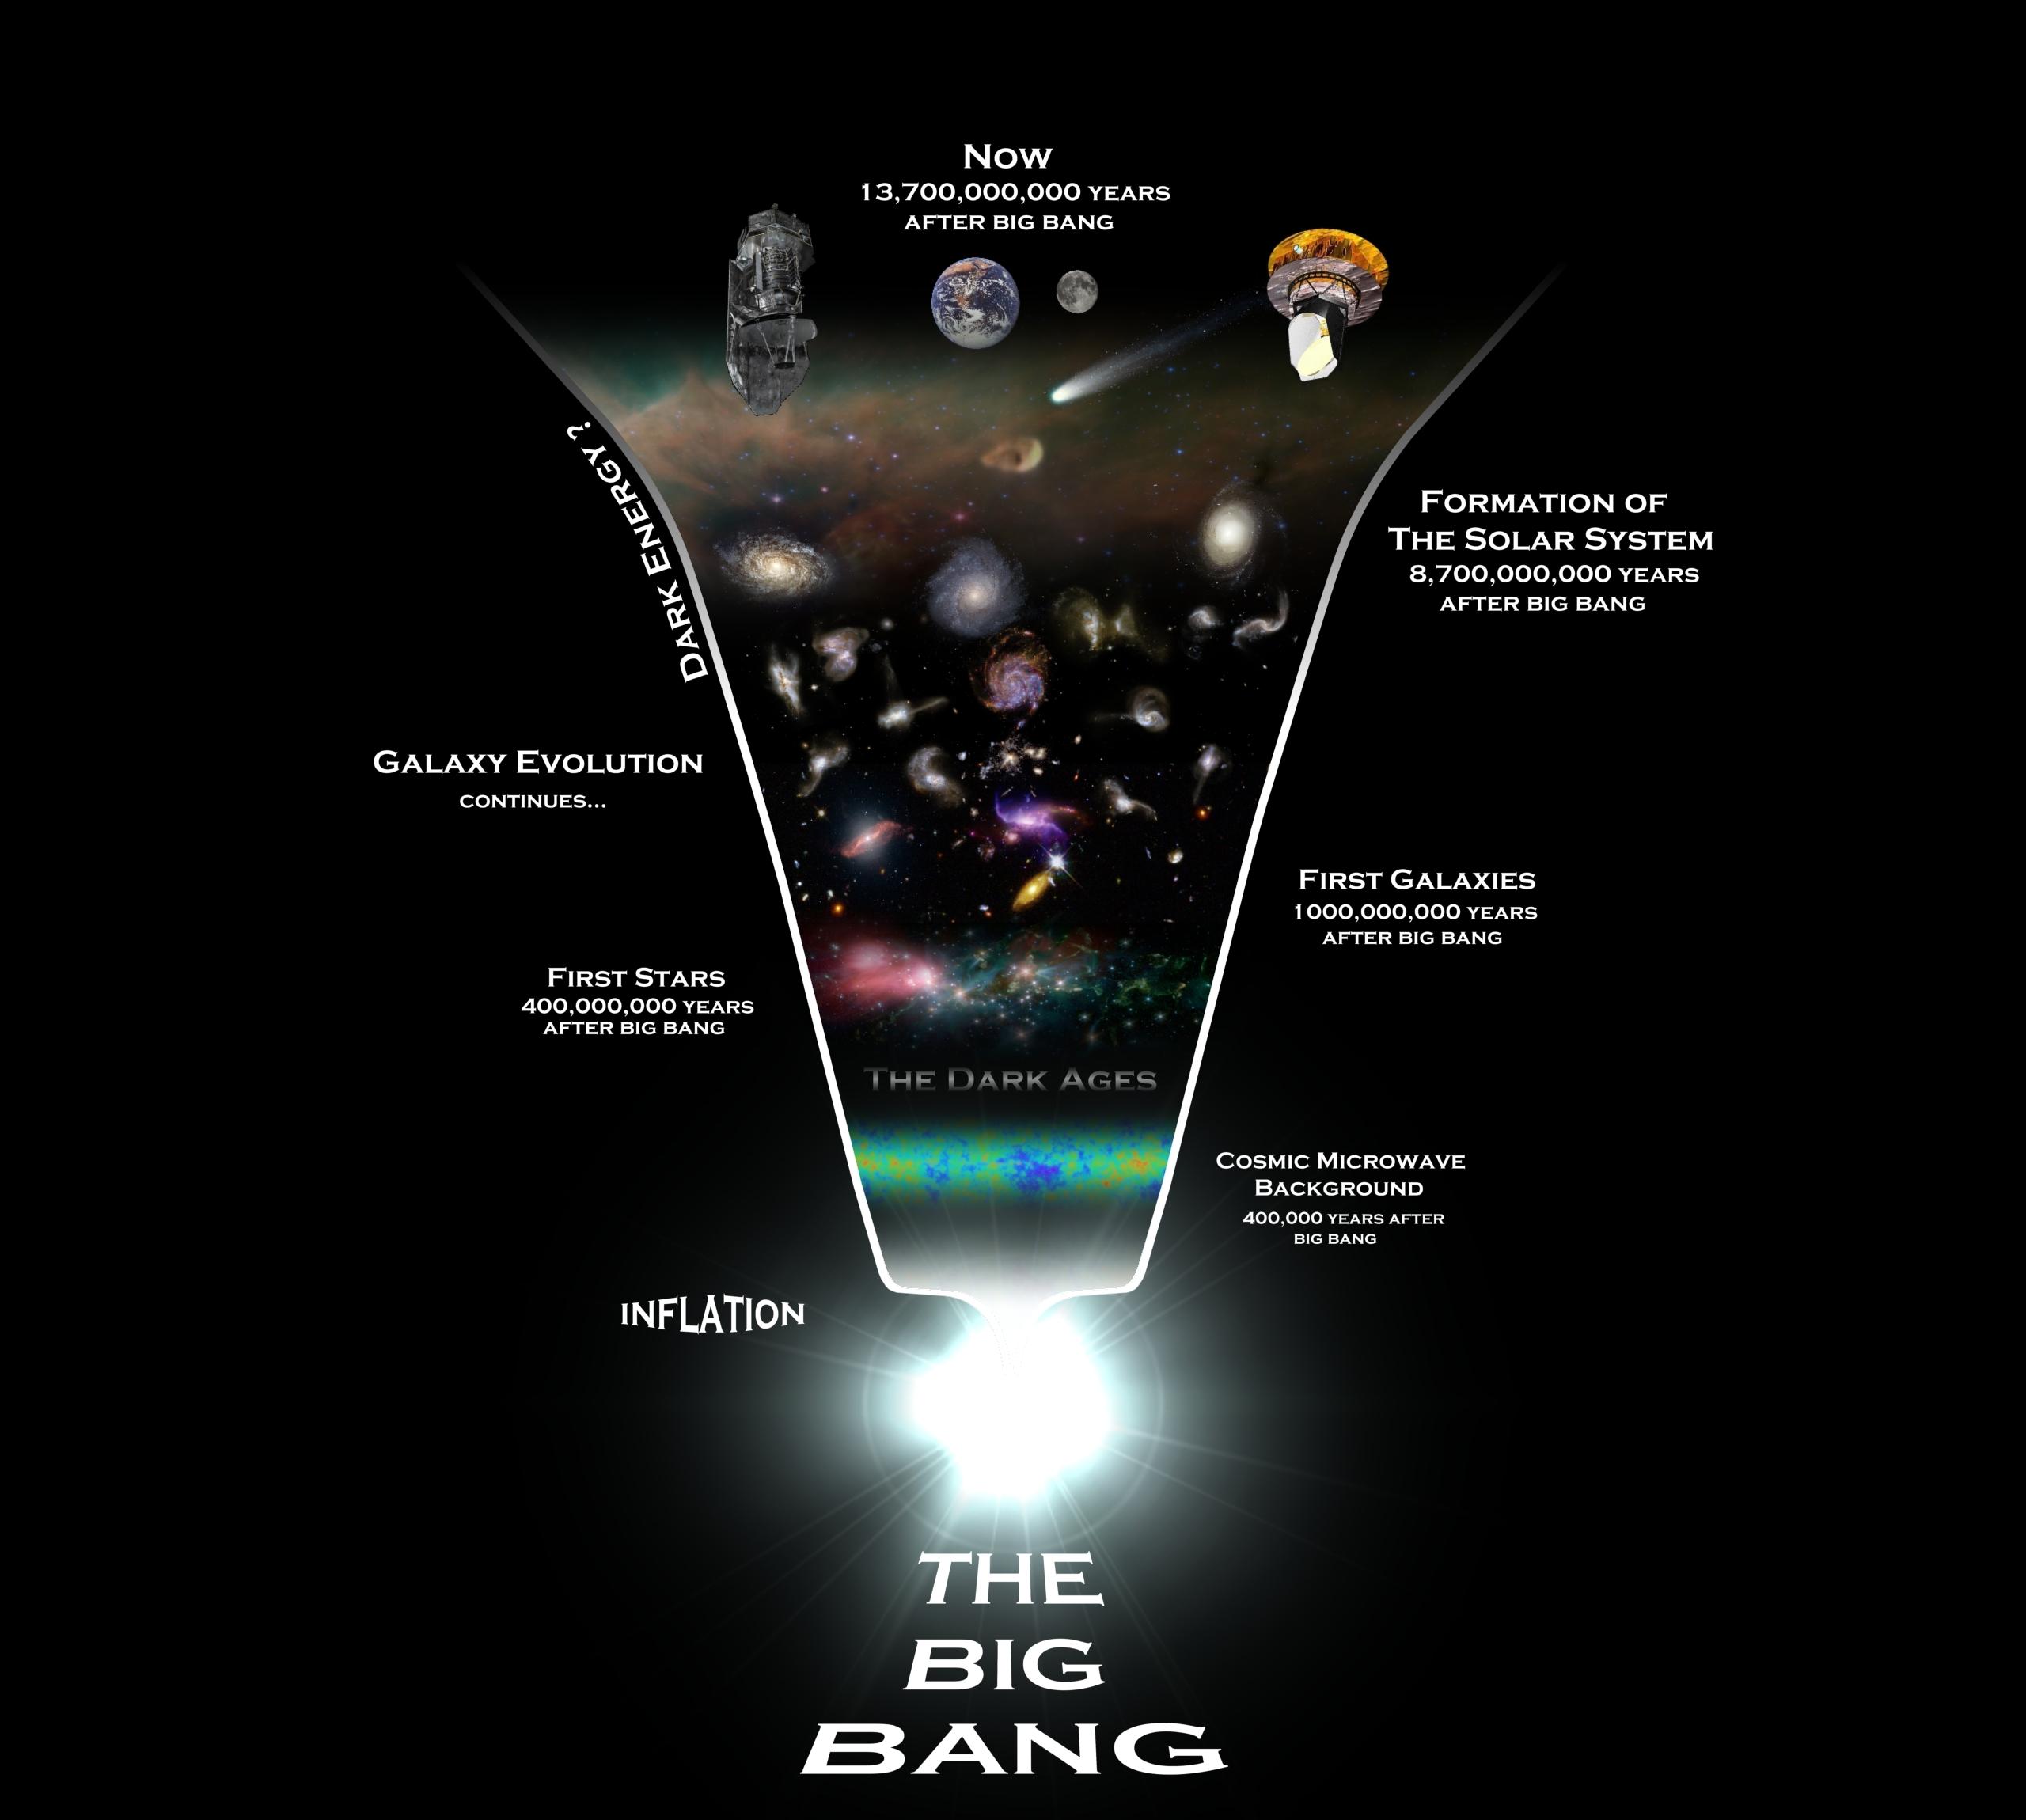 Big Bang Theory Insight The Brainwave